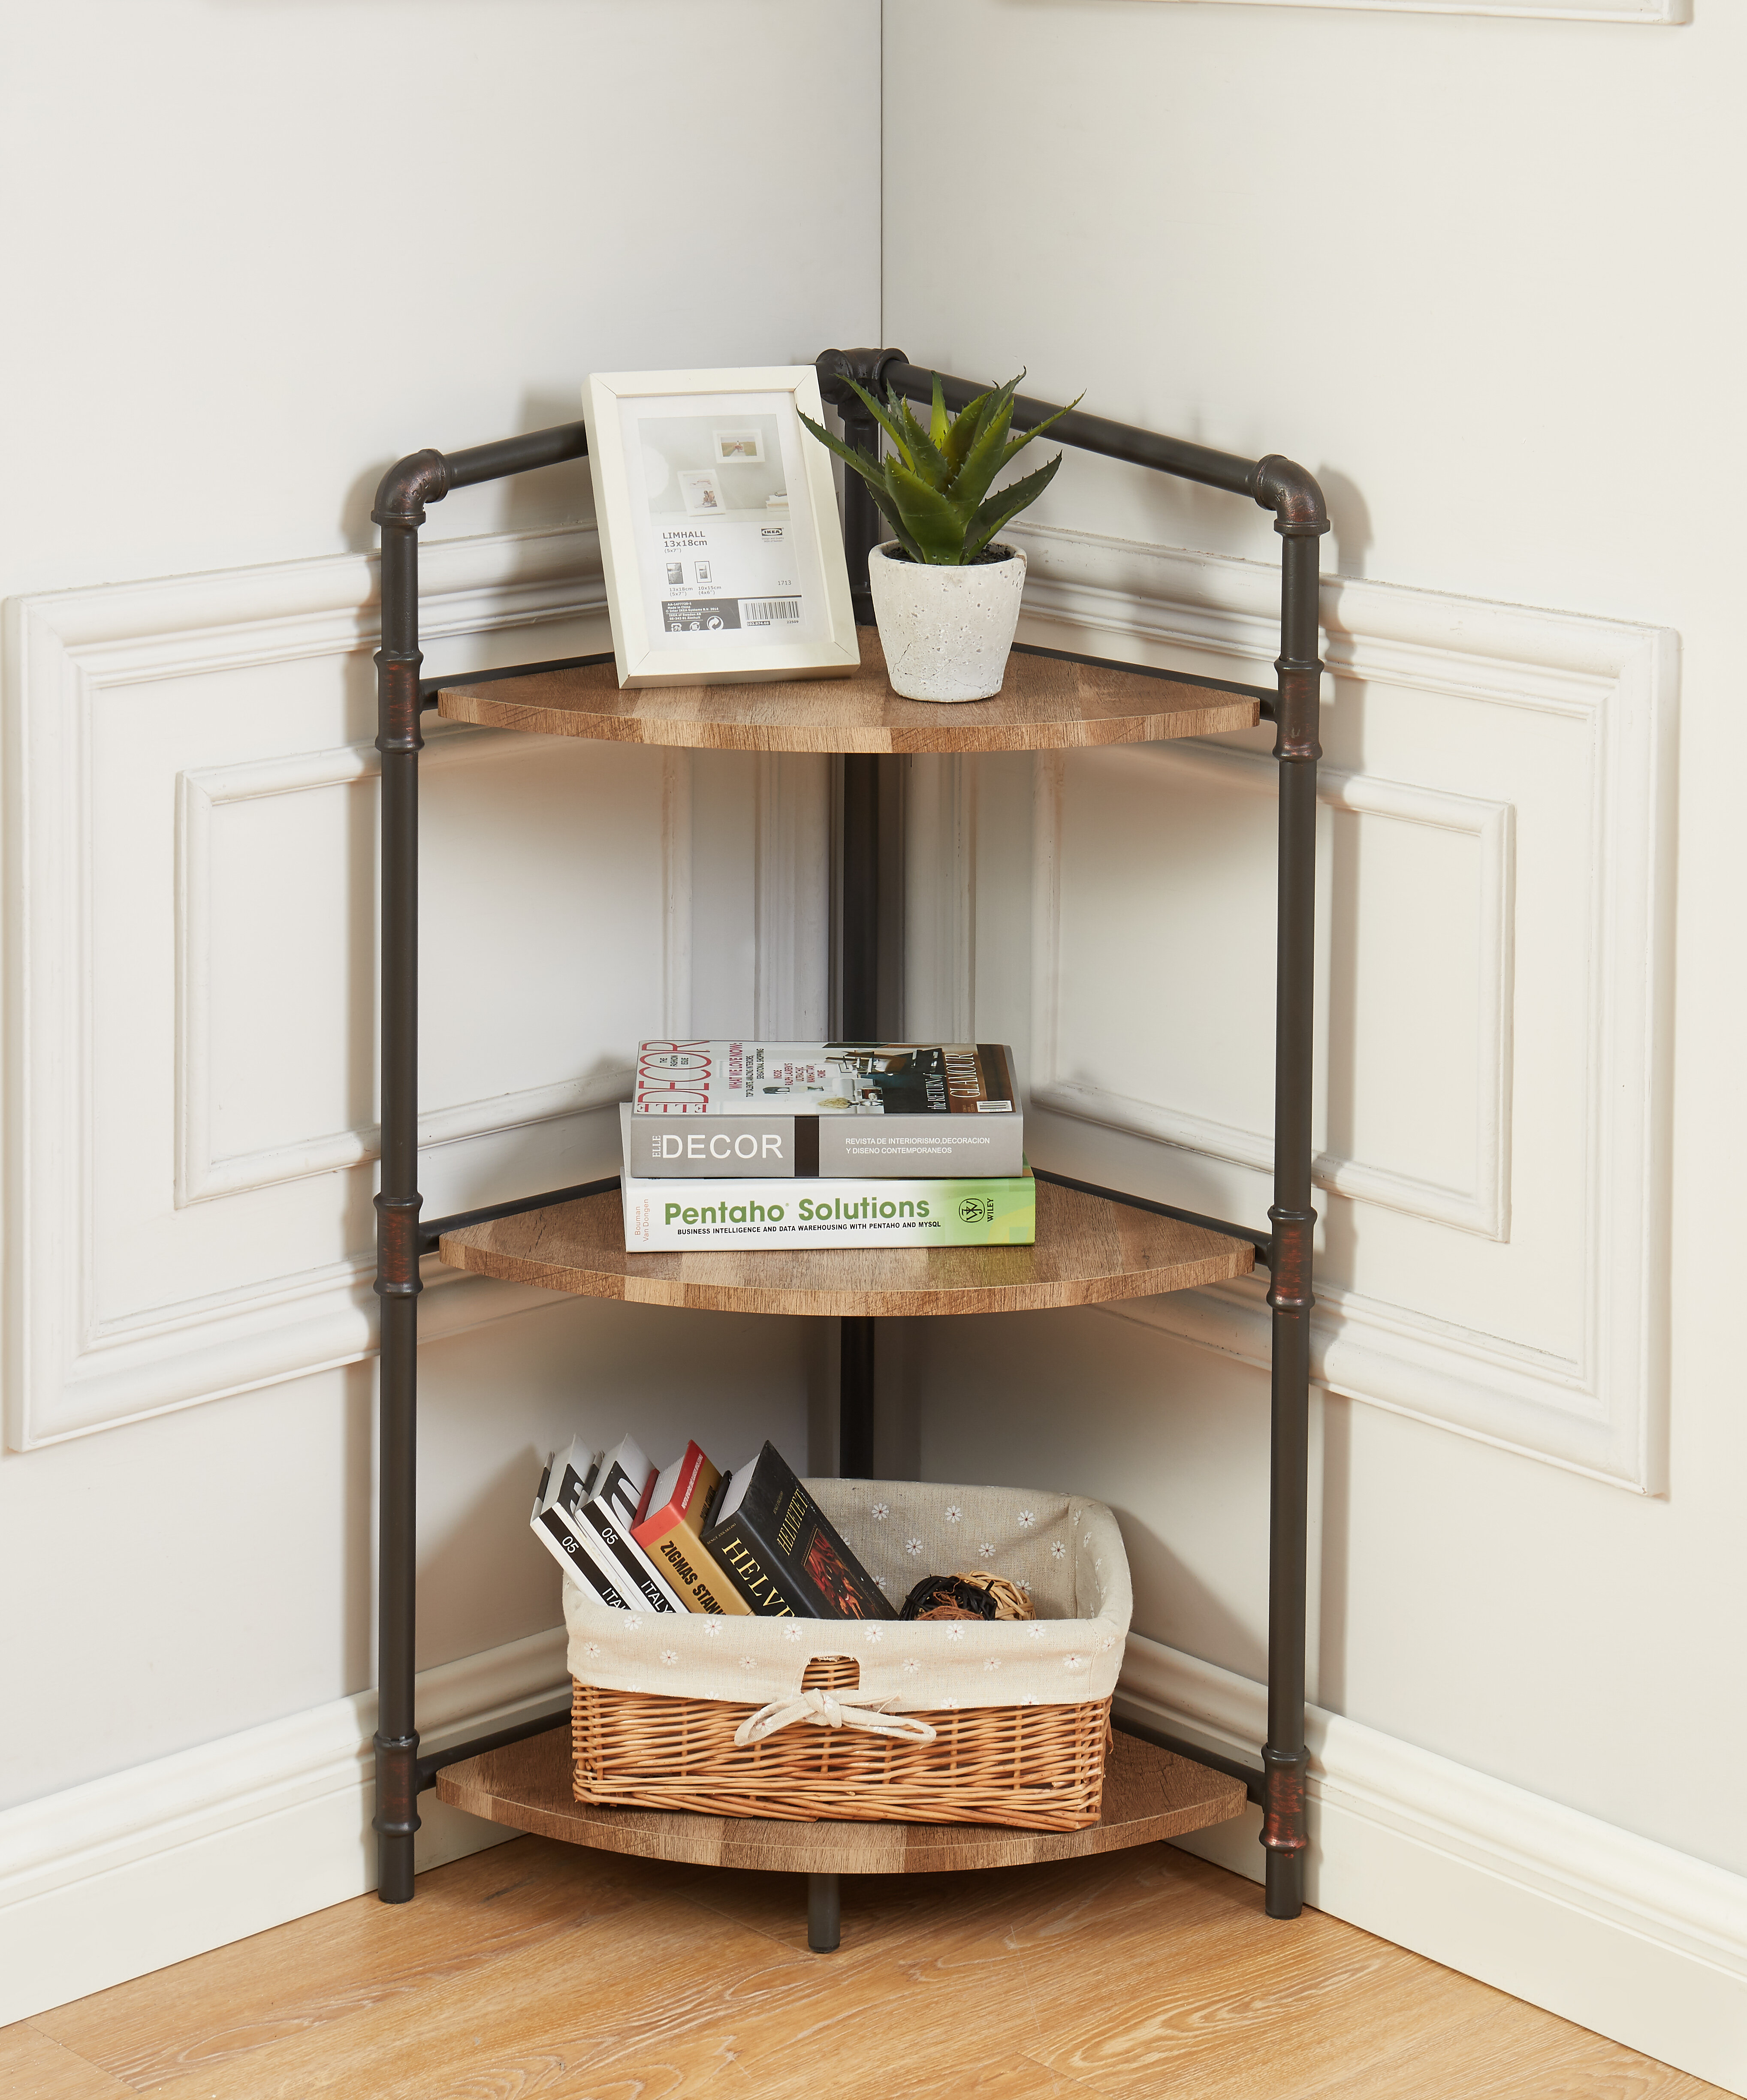 3 Shelf Bookcase Rustic Oak Small Bookshelf Short Wooden Compact Open Standard